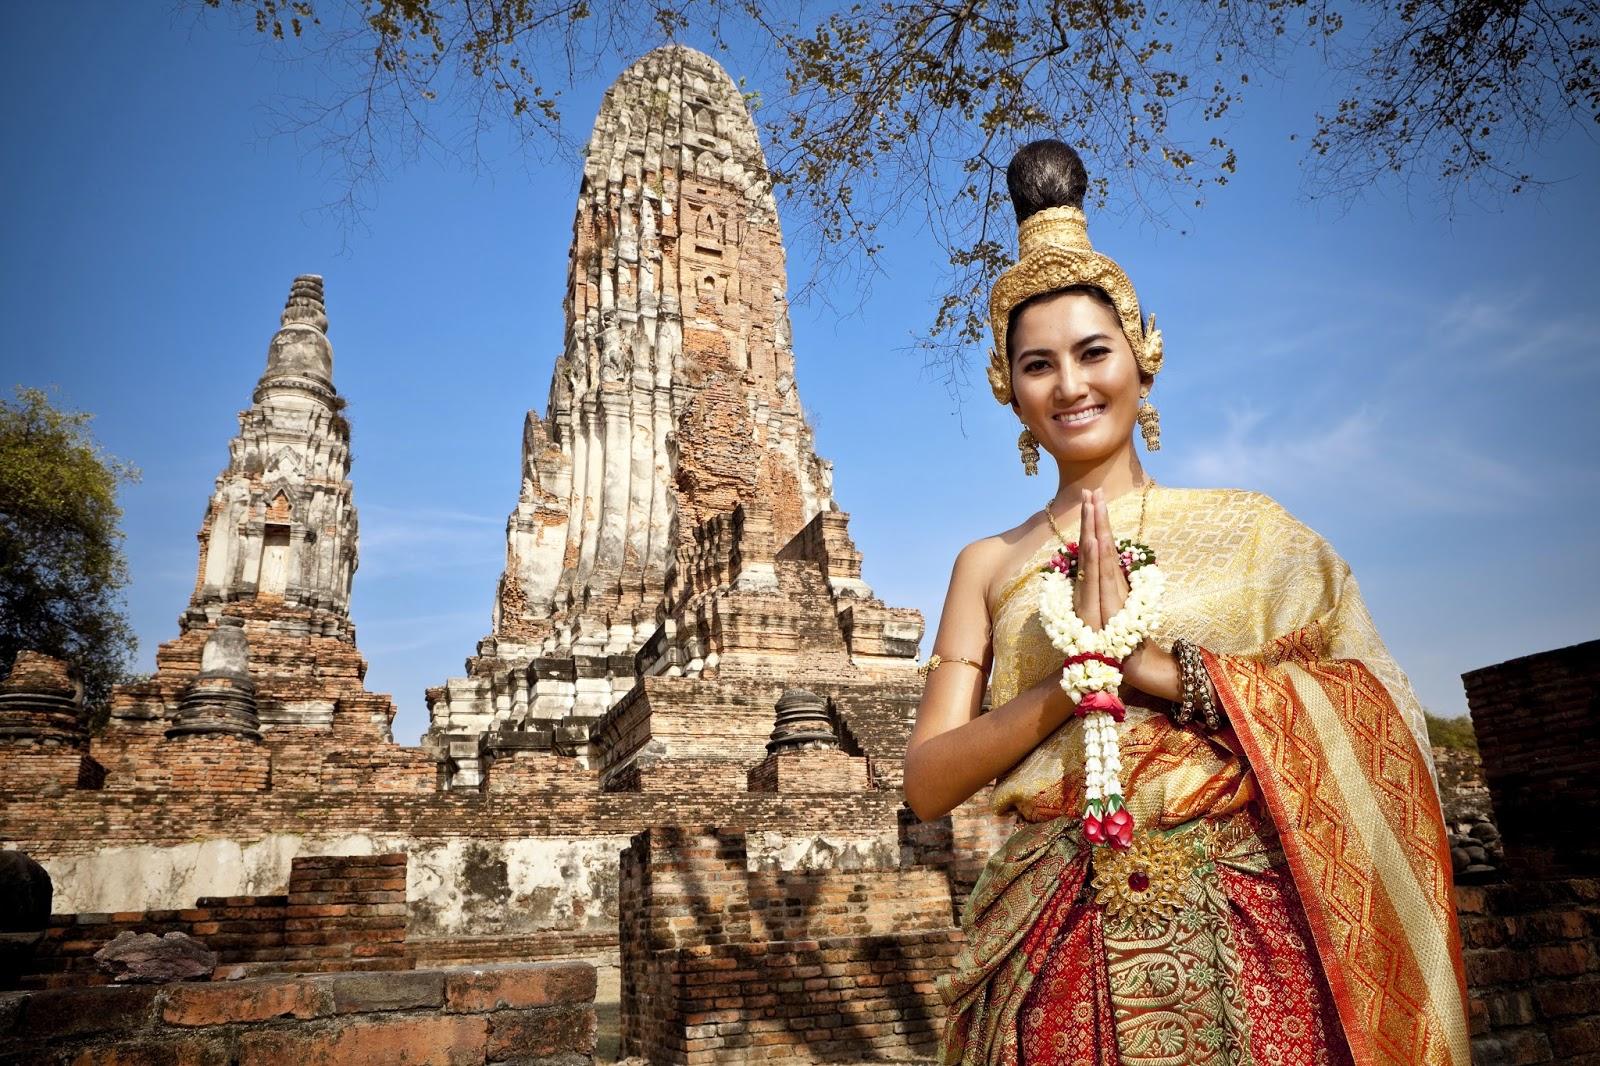 Chatrium Can Help You Explore Thai Culture, Thai Products ...  |Thai Culture